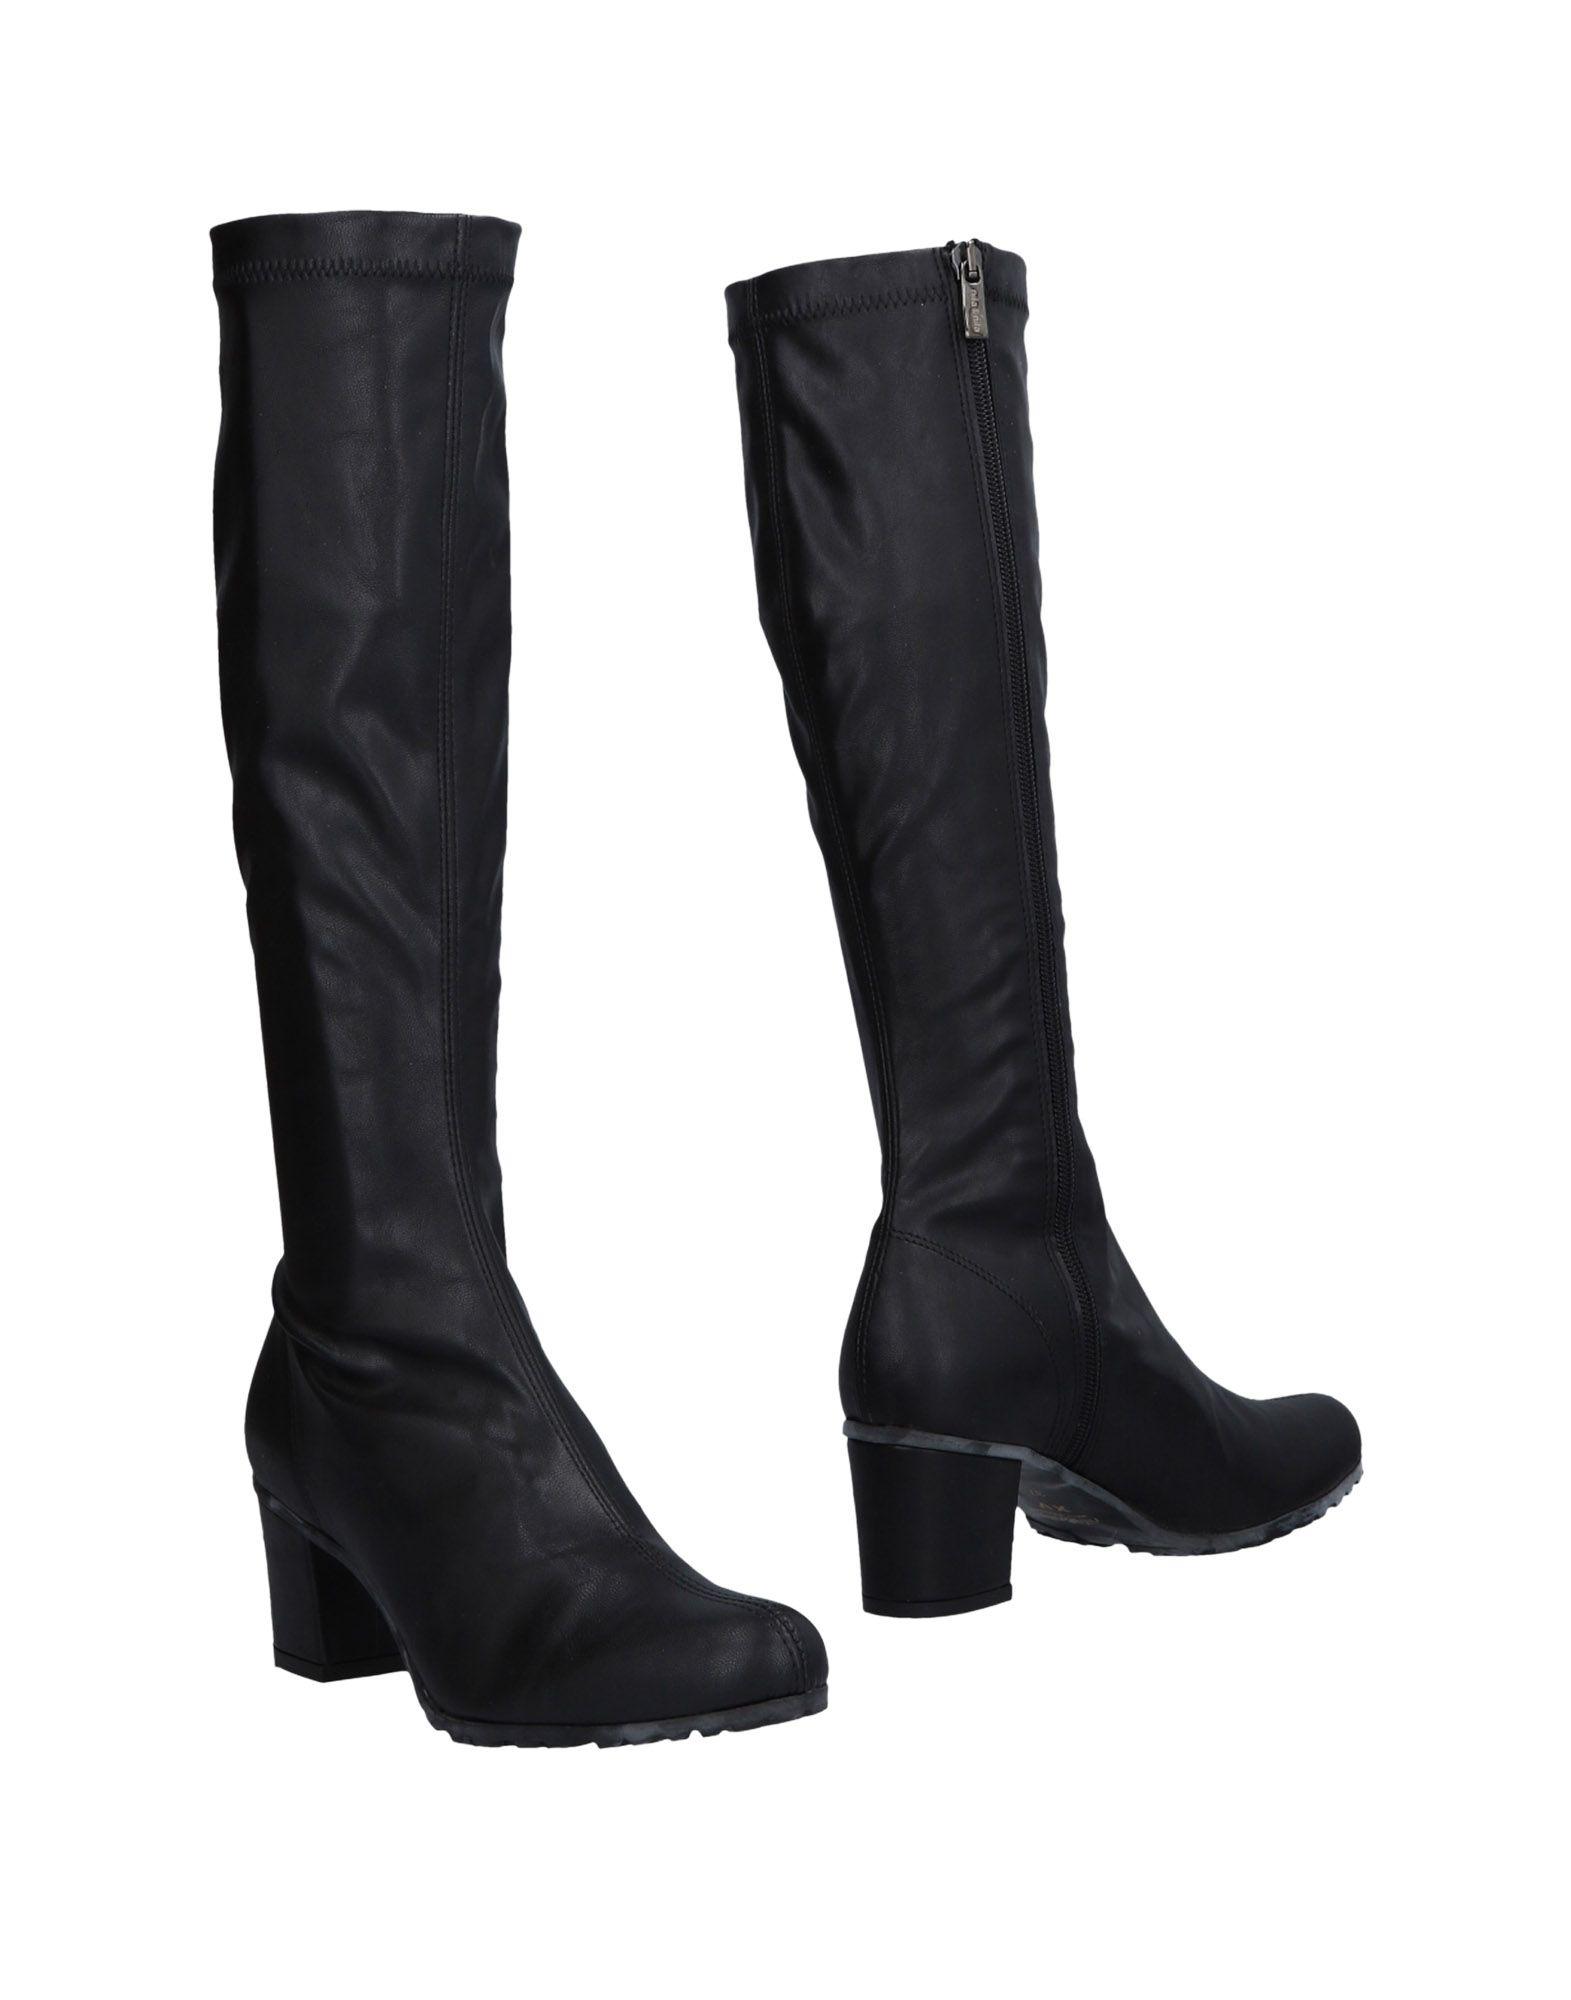 Nila & Nila Boots - Women Nila & Nila United Boots online on  United Nila Kingdom - 11474790RX 16e157